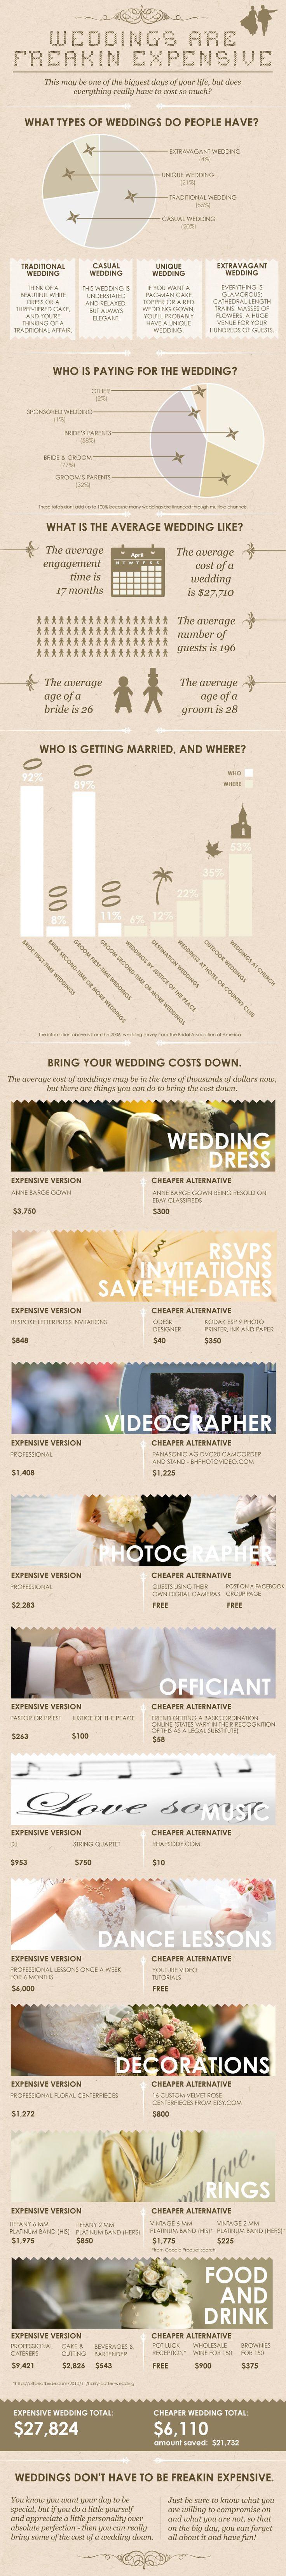 bride/ wedding budget